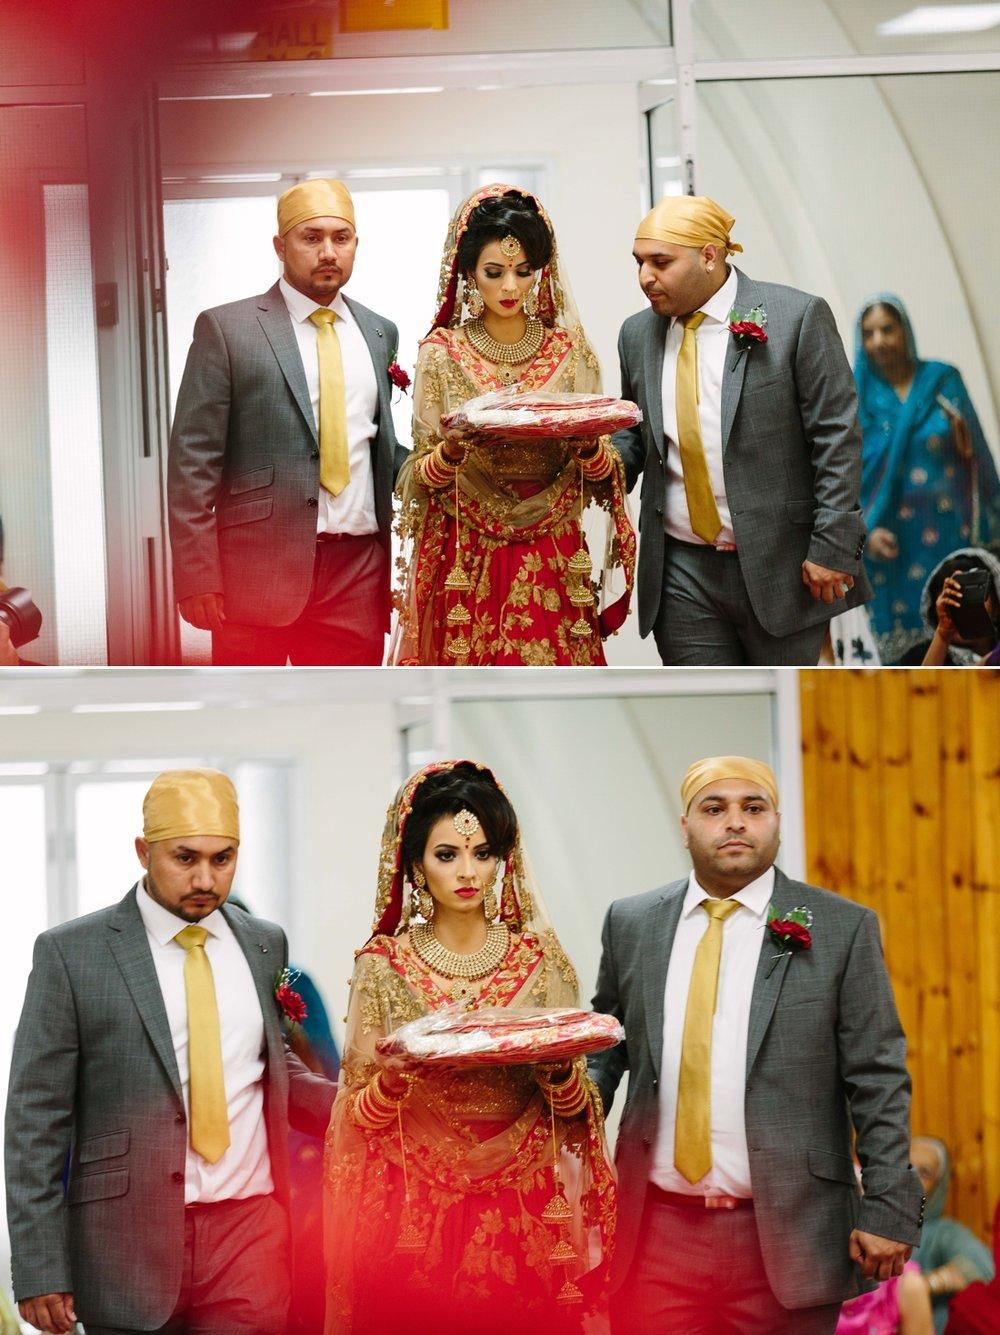 Gurpreet and Nick Sikh Wedding - Southampton - Photos by Abhi 10.jpg